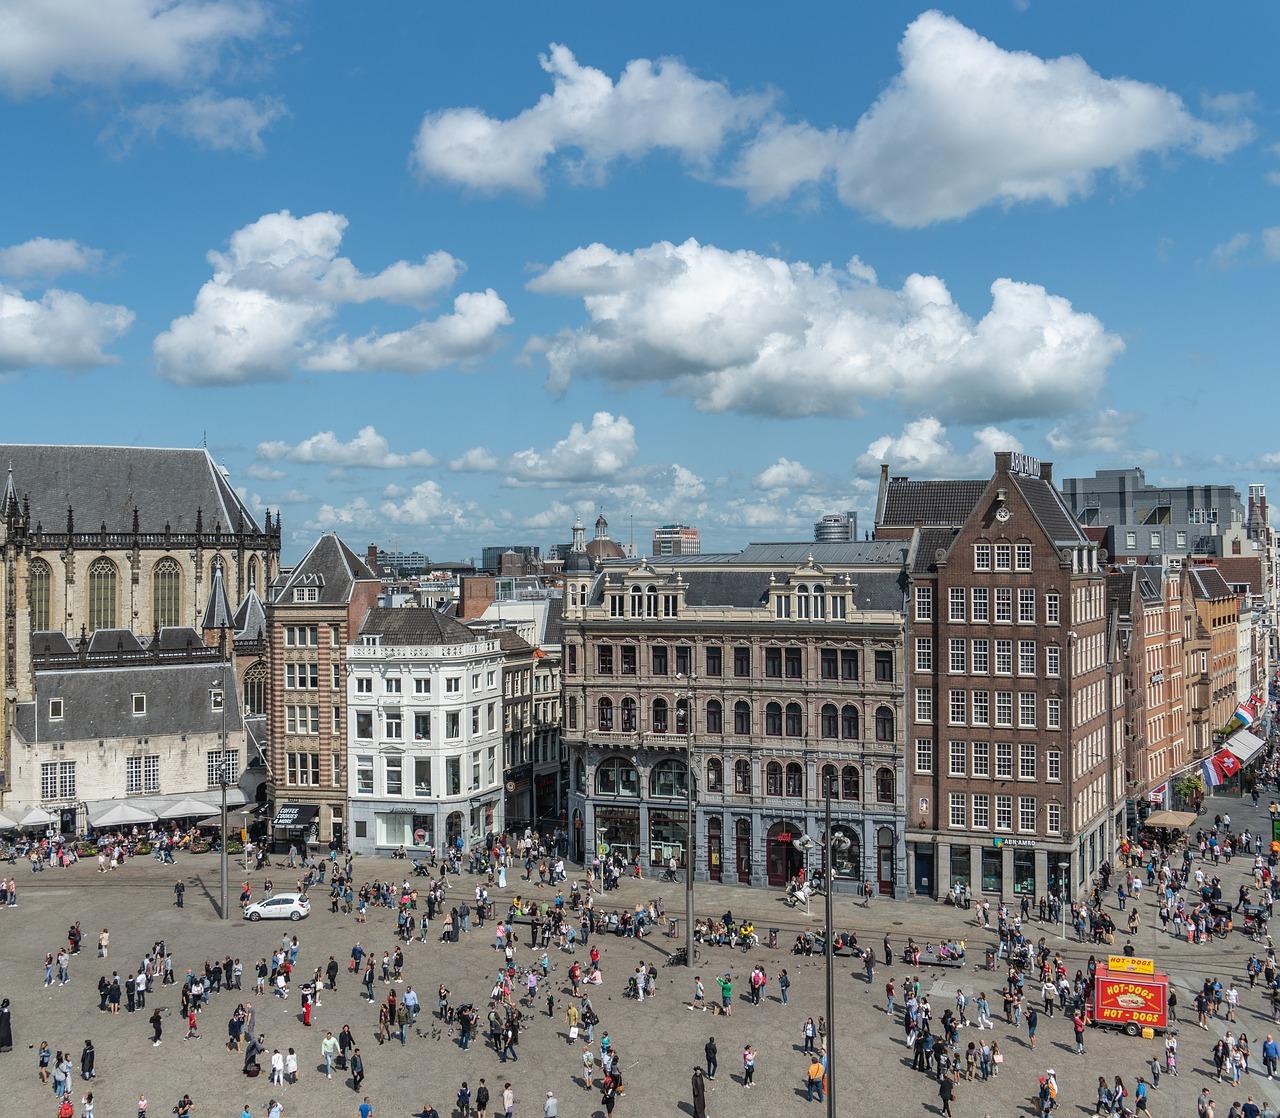 amsterdam-4447145_1280.jpg?1568105907